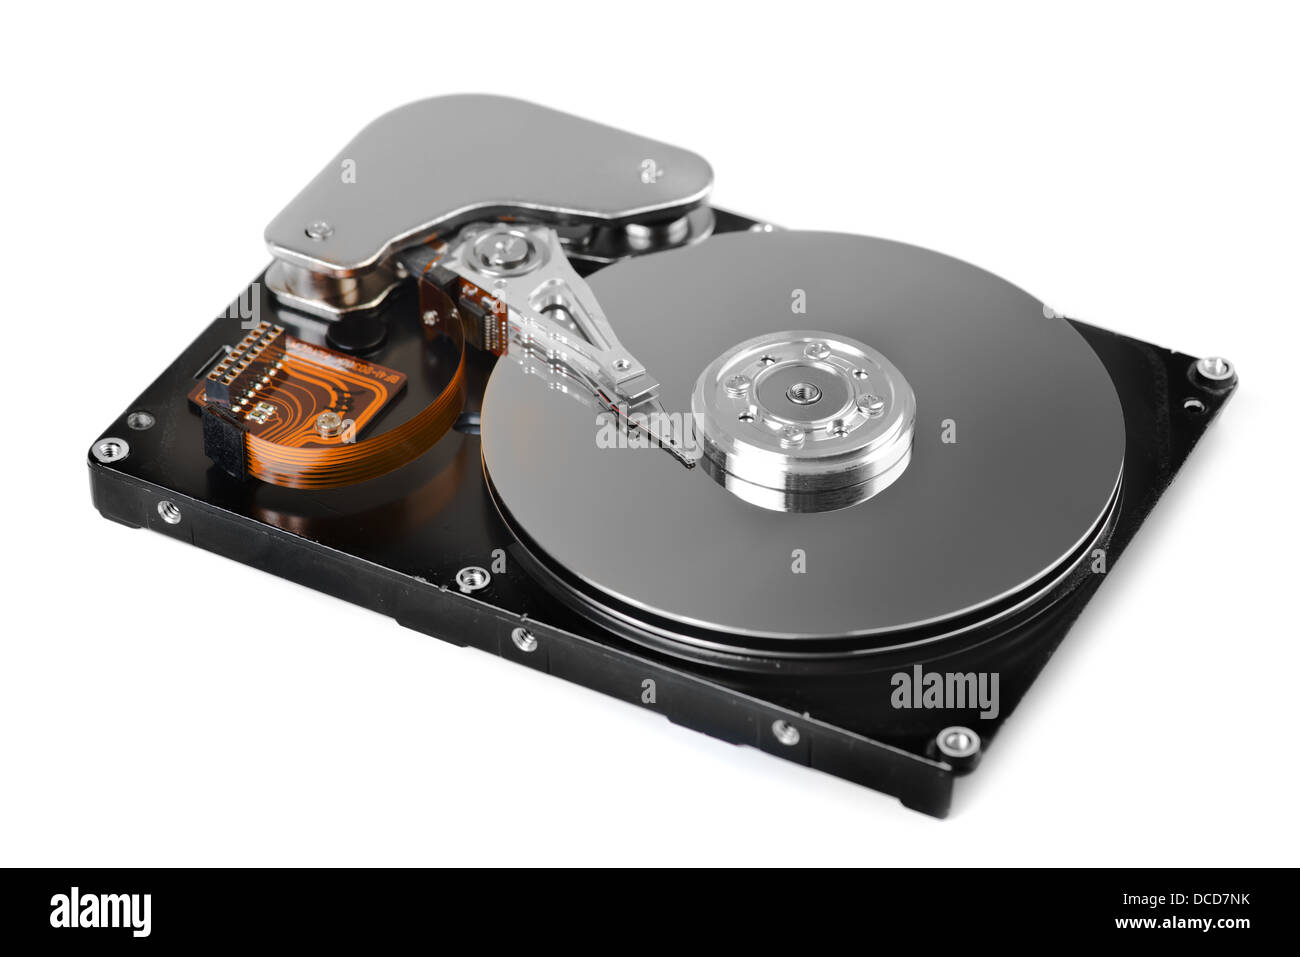 Hard disk drive inside - Stock Image